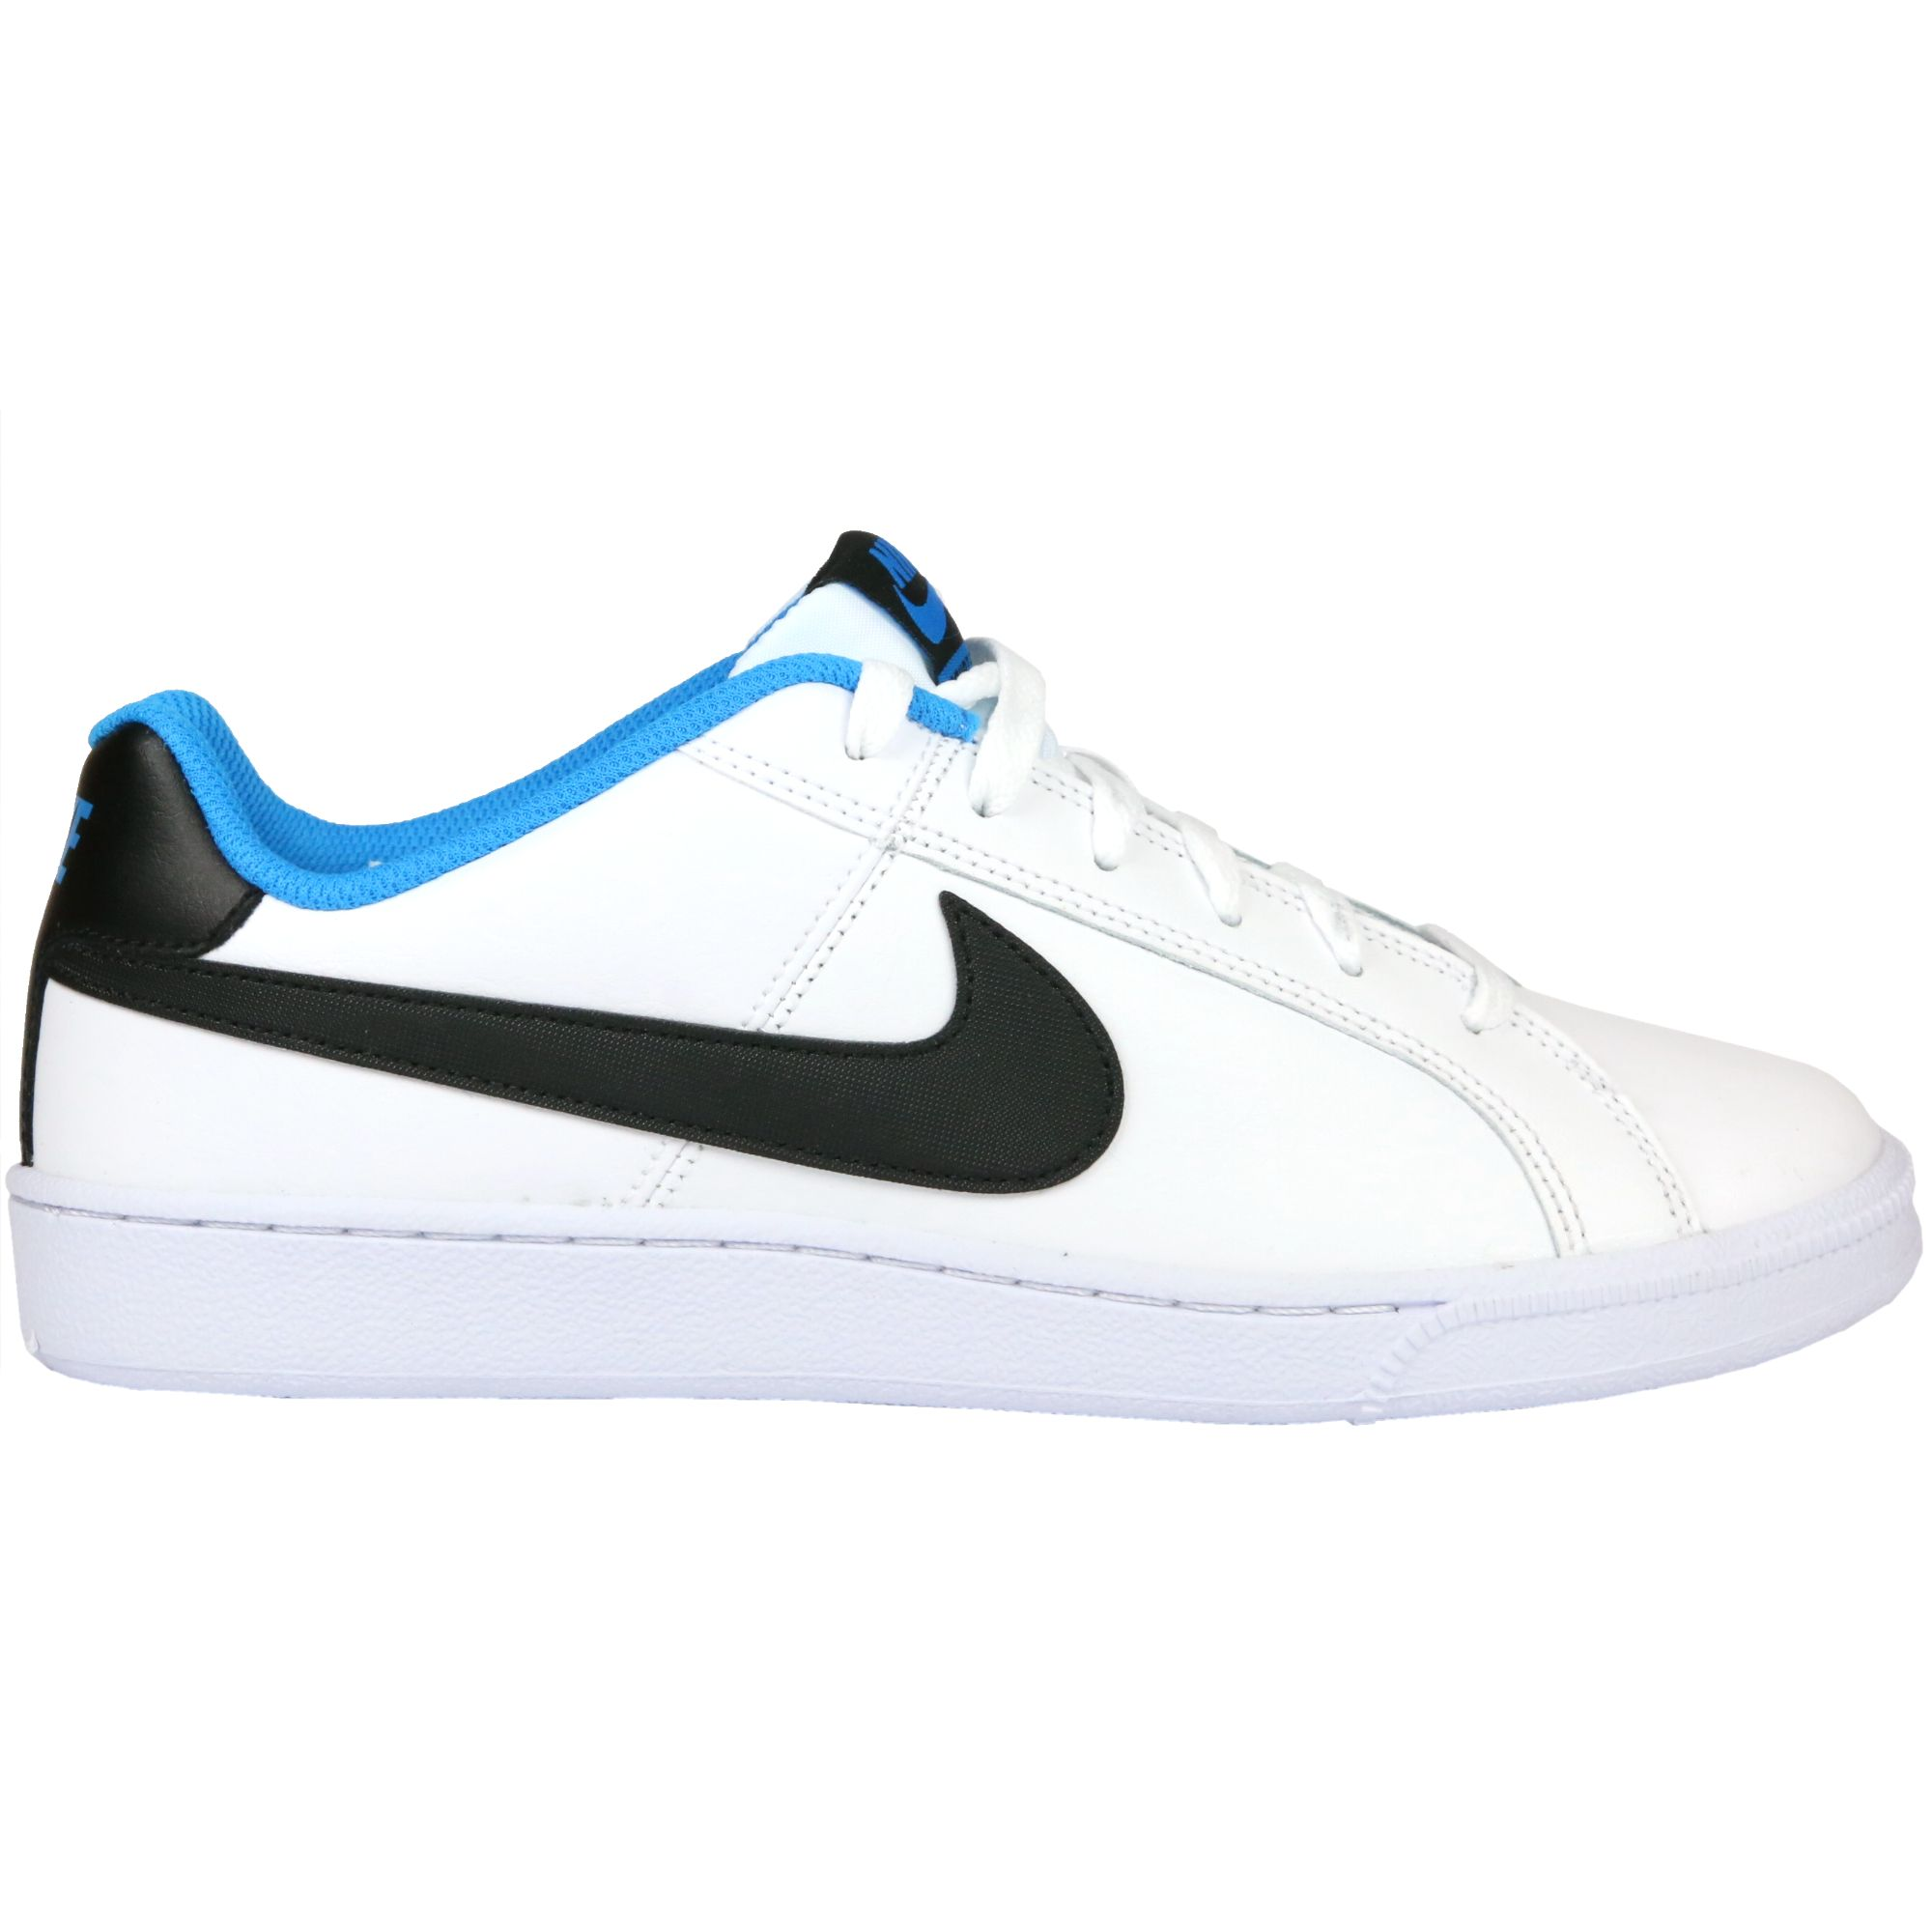 Scarpe Nike Pelle Uomo Testo 67ae81bf2b1